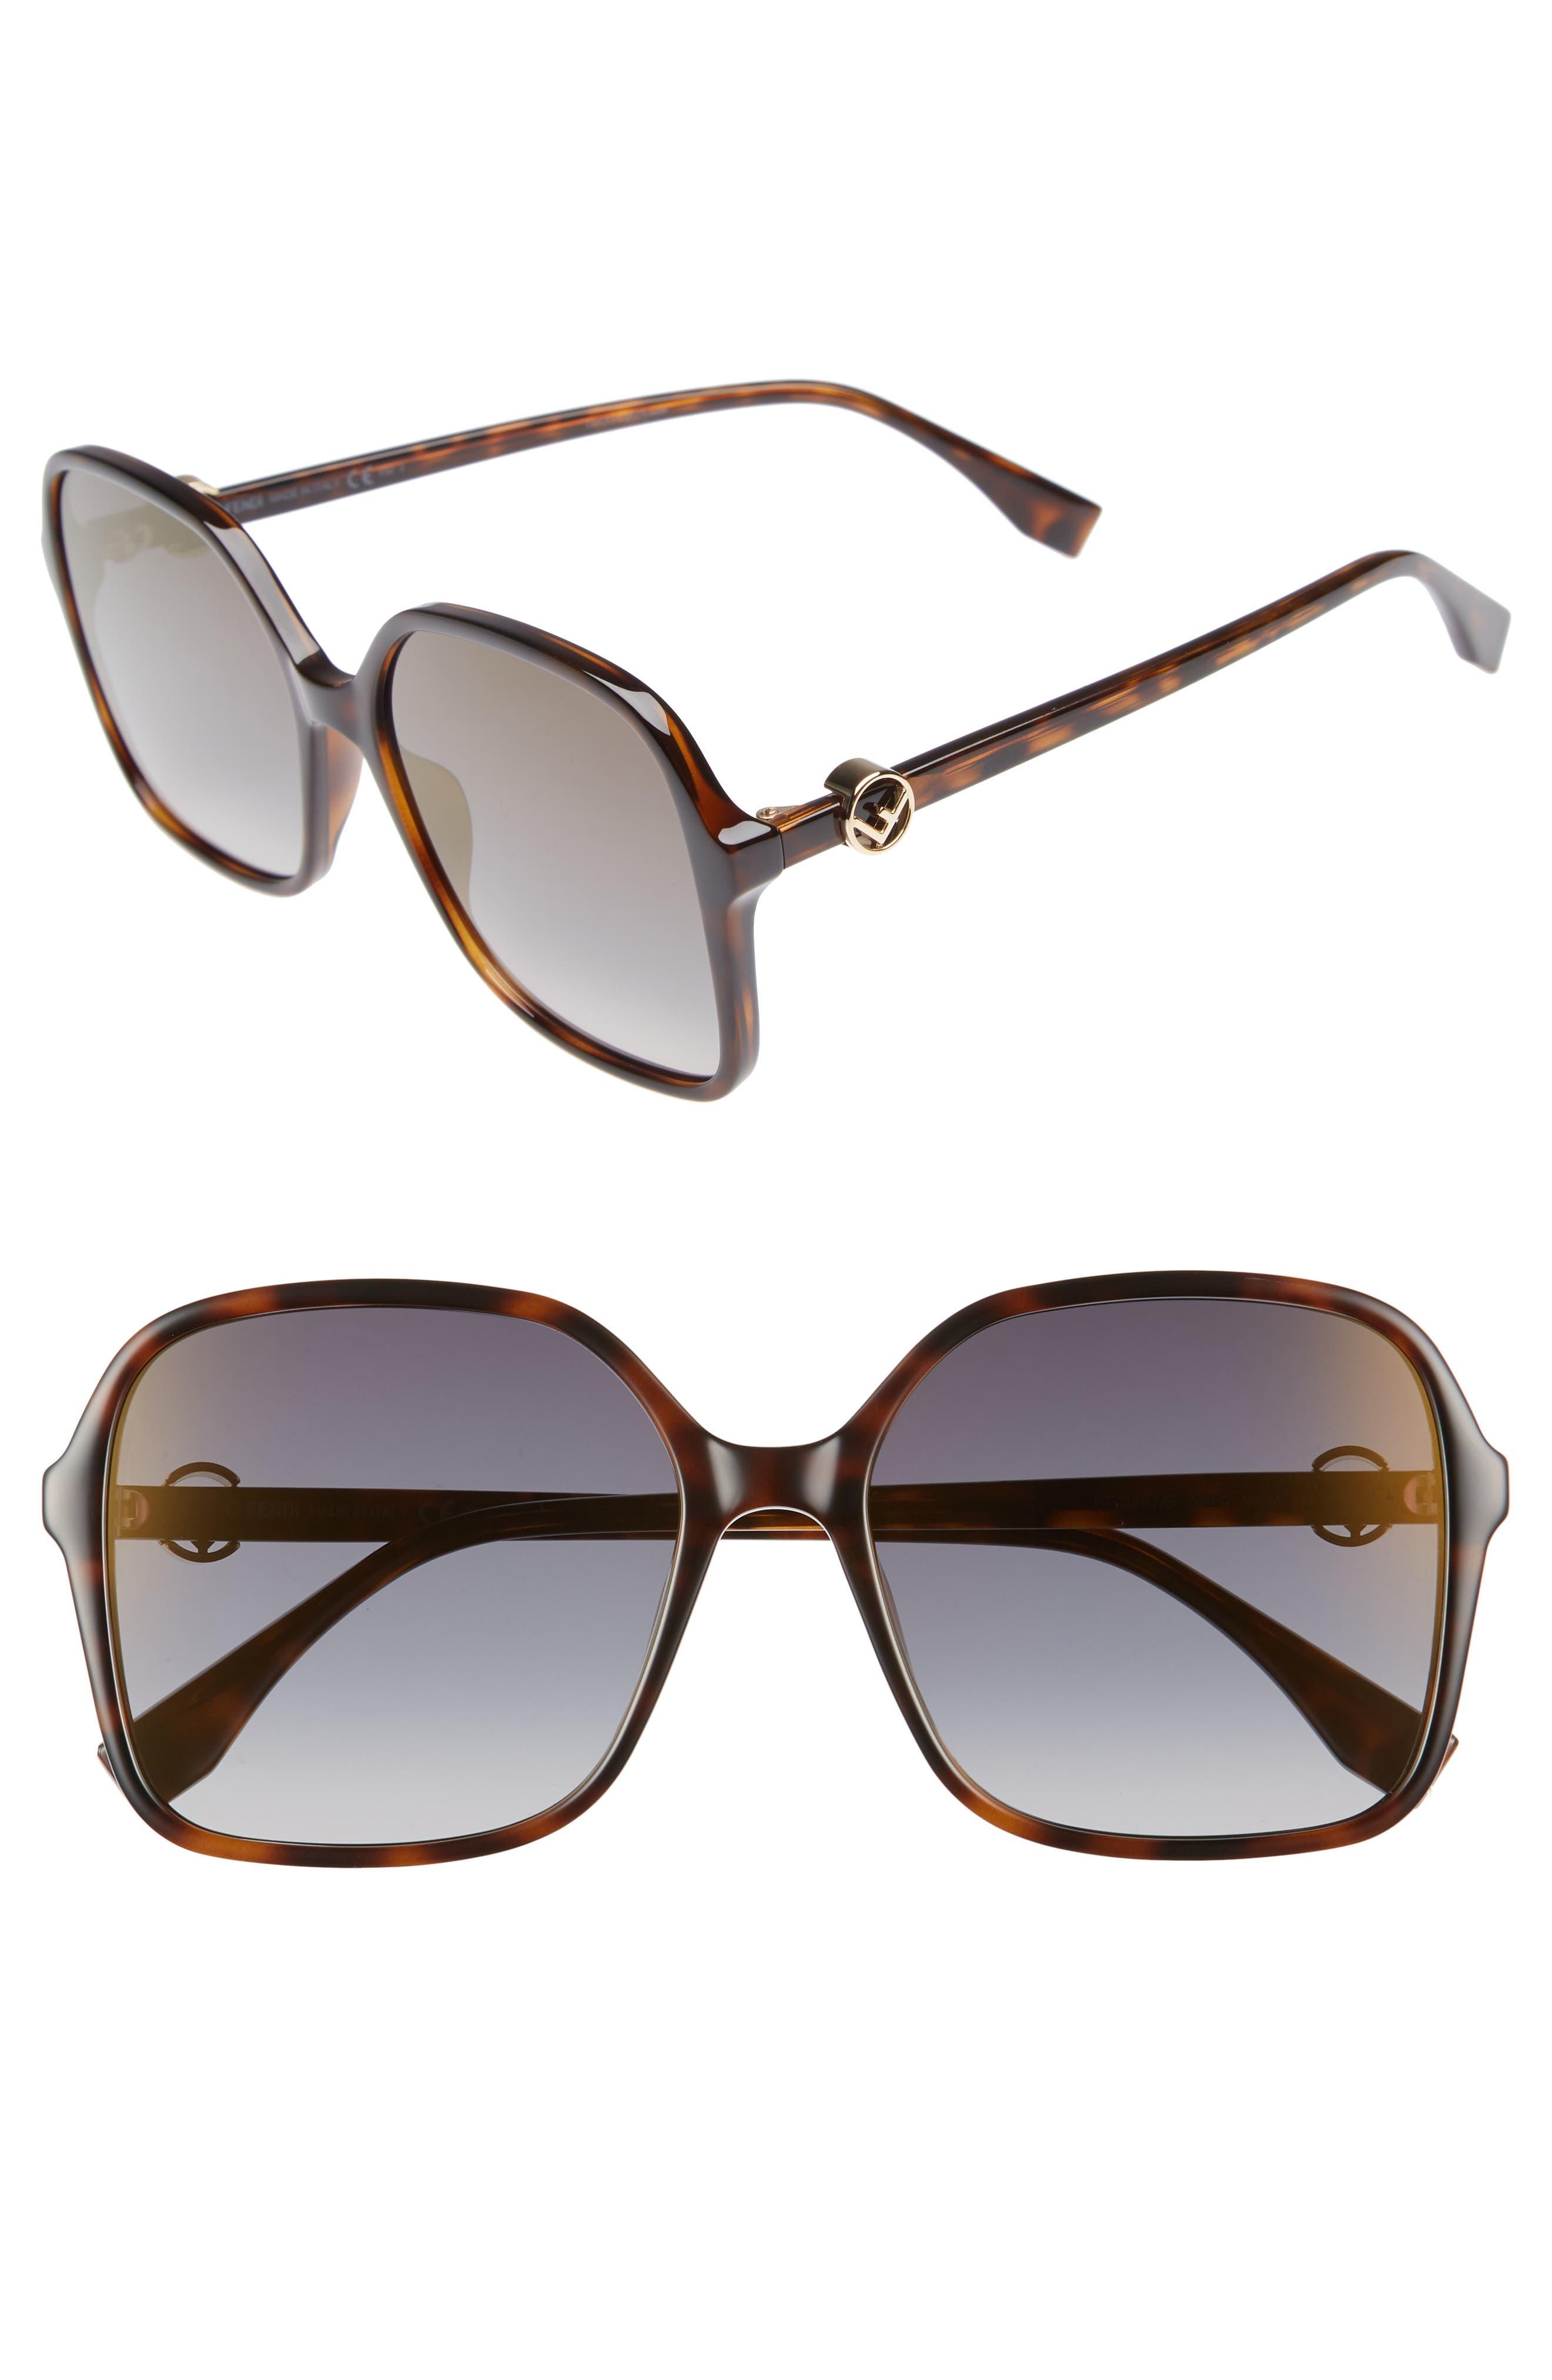 58mm Square Sunglasses,                             Main thumbnail 1, color,                             Dark Havana